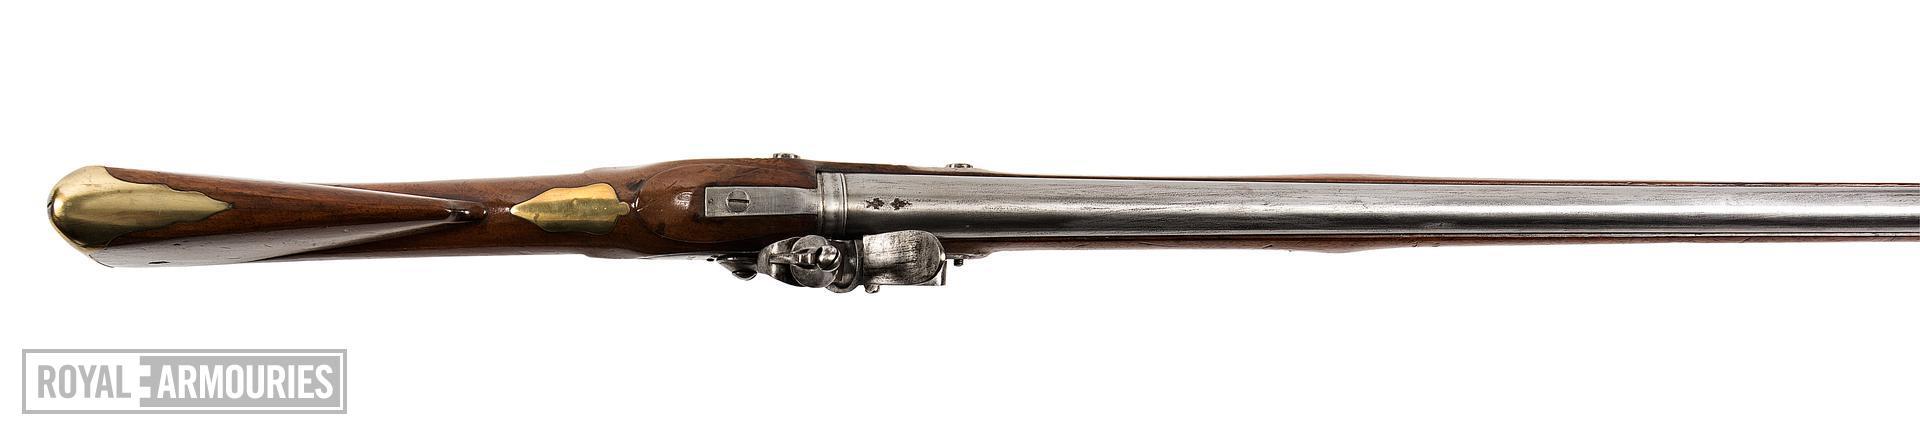 Flintlock muzzle-loading military musket - Model 1777 Short Land Pattern